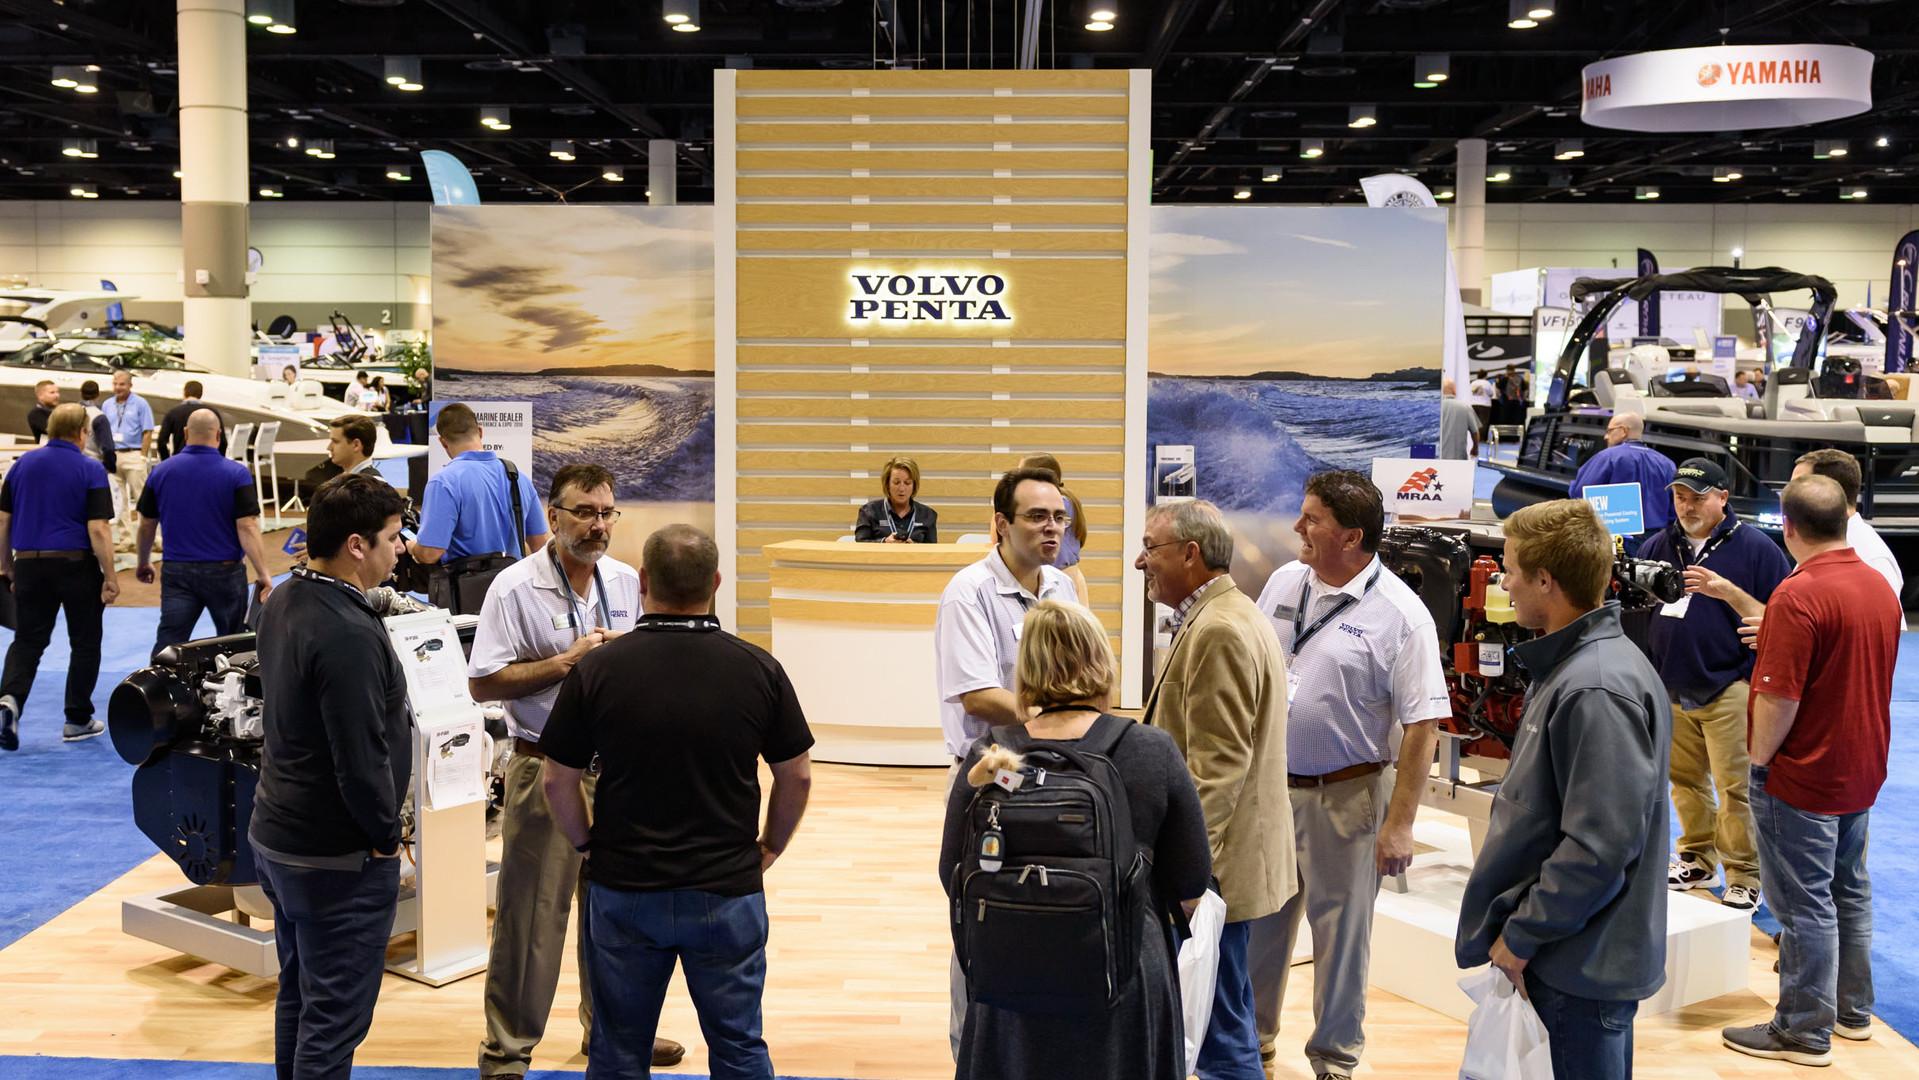 Volvo exhibiting in 2018